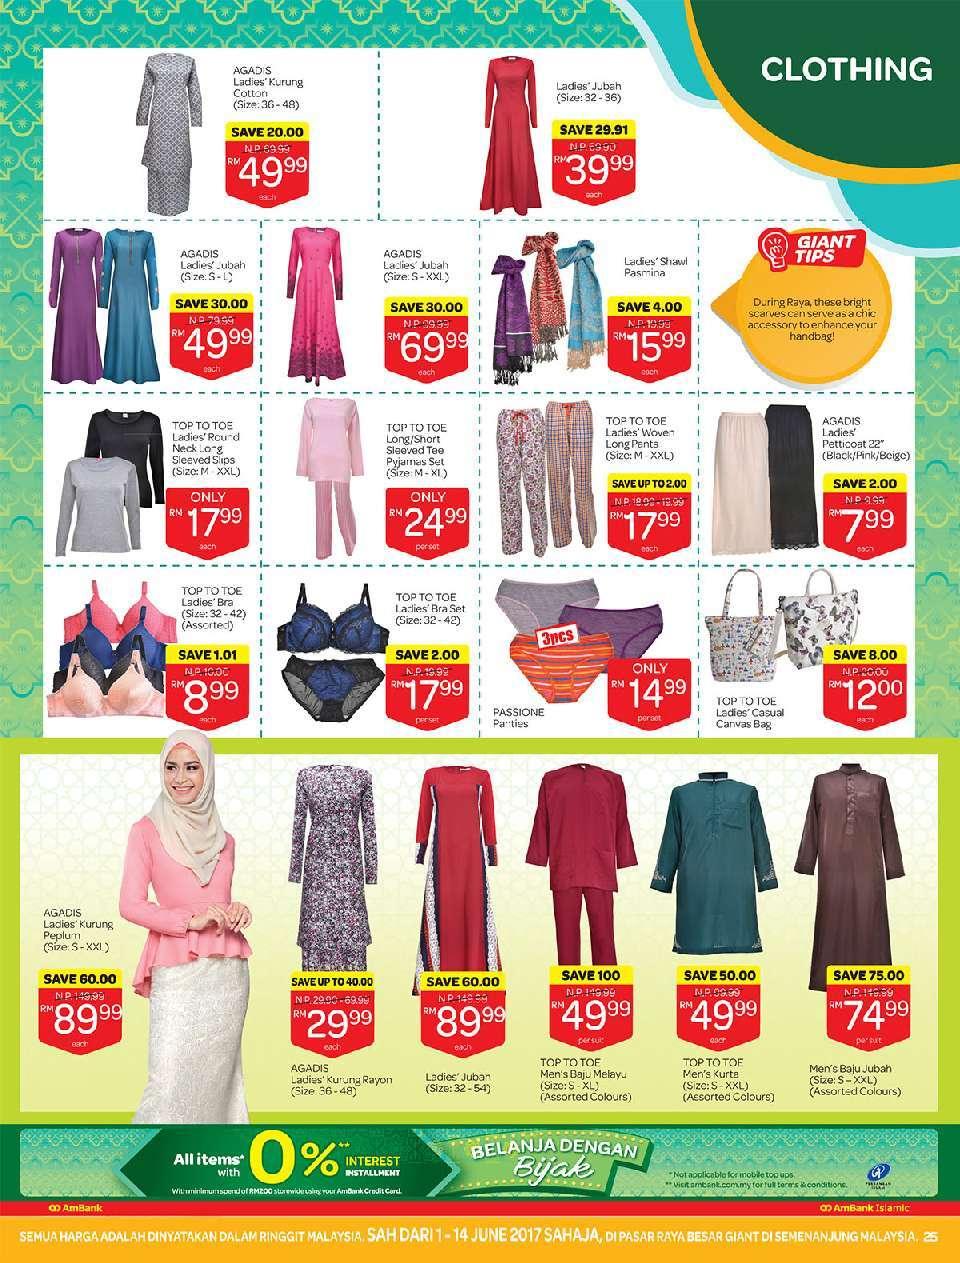 Giant Catalogue (1 June 2017 - 14 Jun 2017)